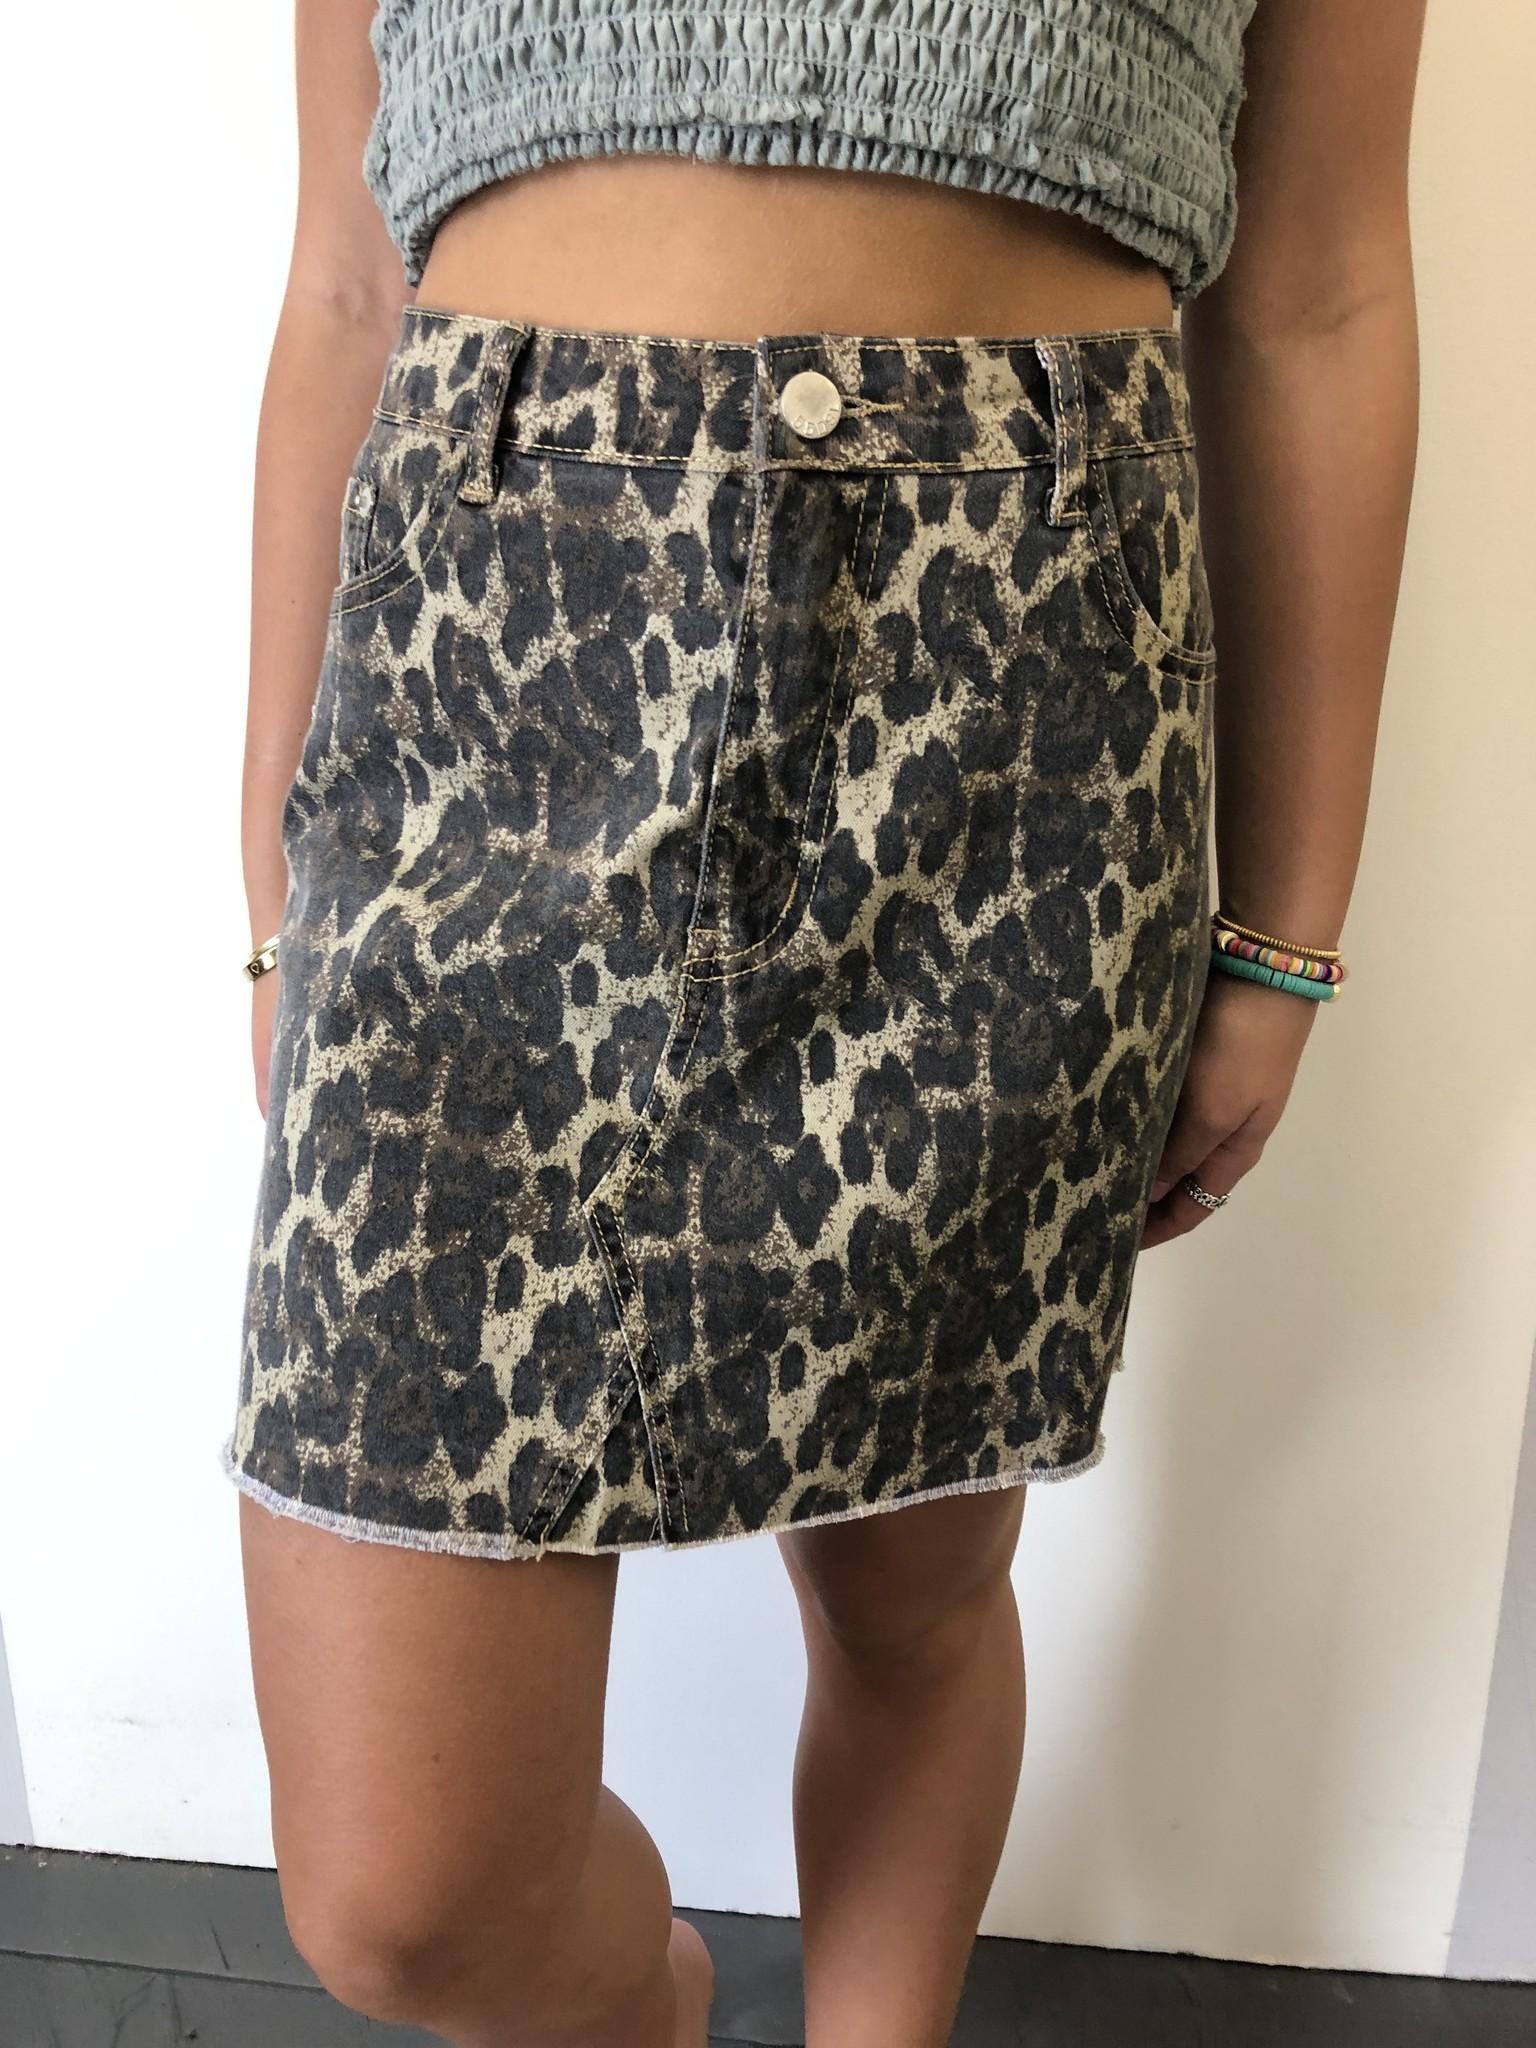 Camel Leopard Print Skirt